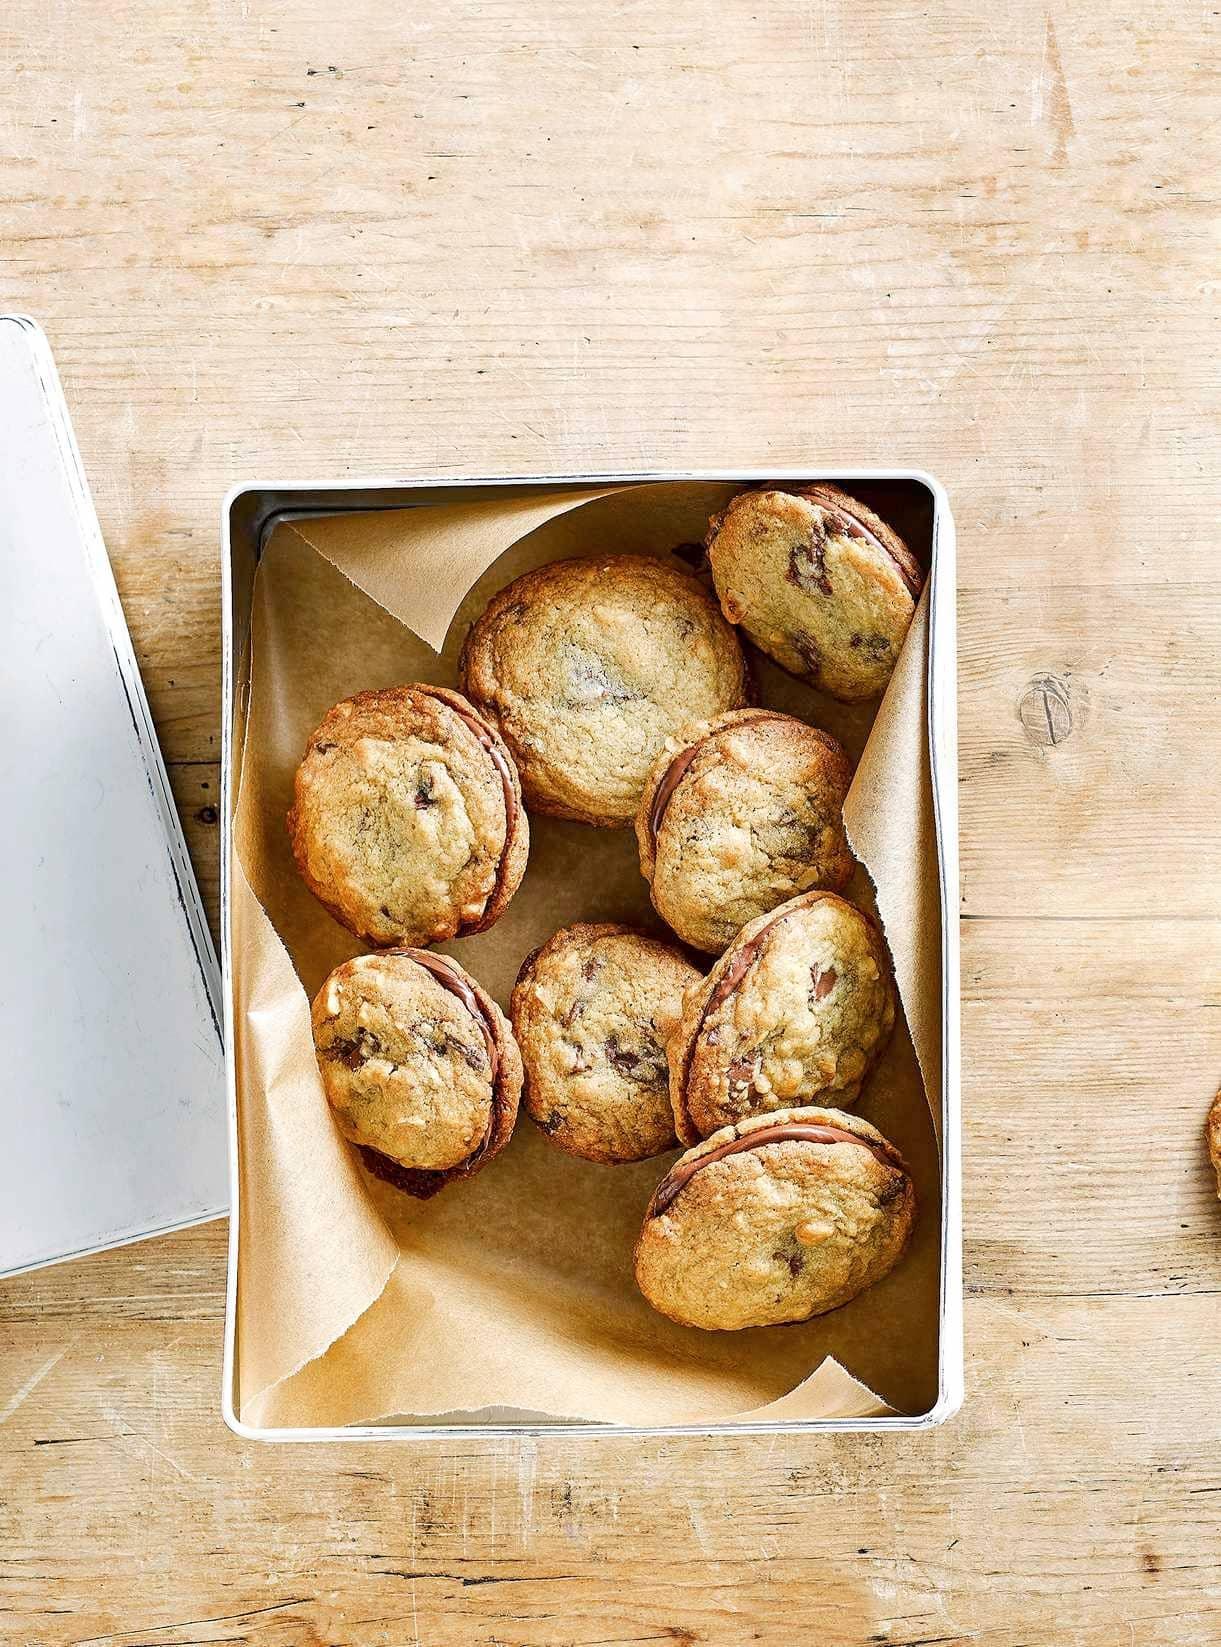 Stuffed Cookie Sandwiches